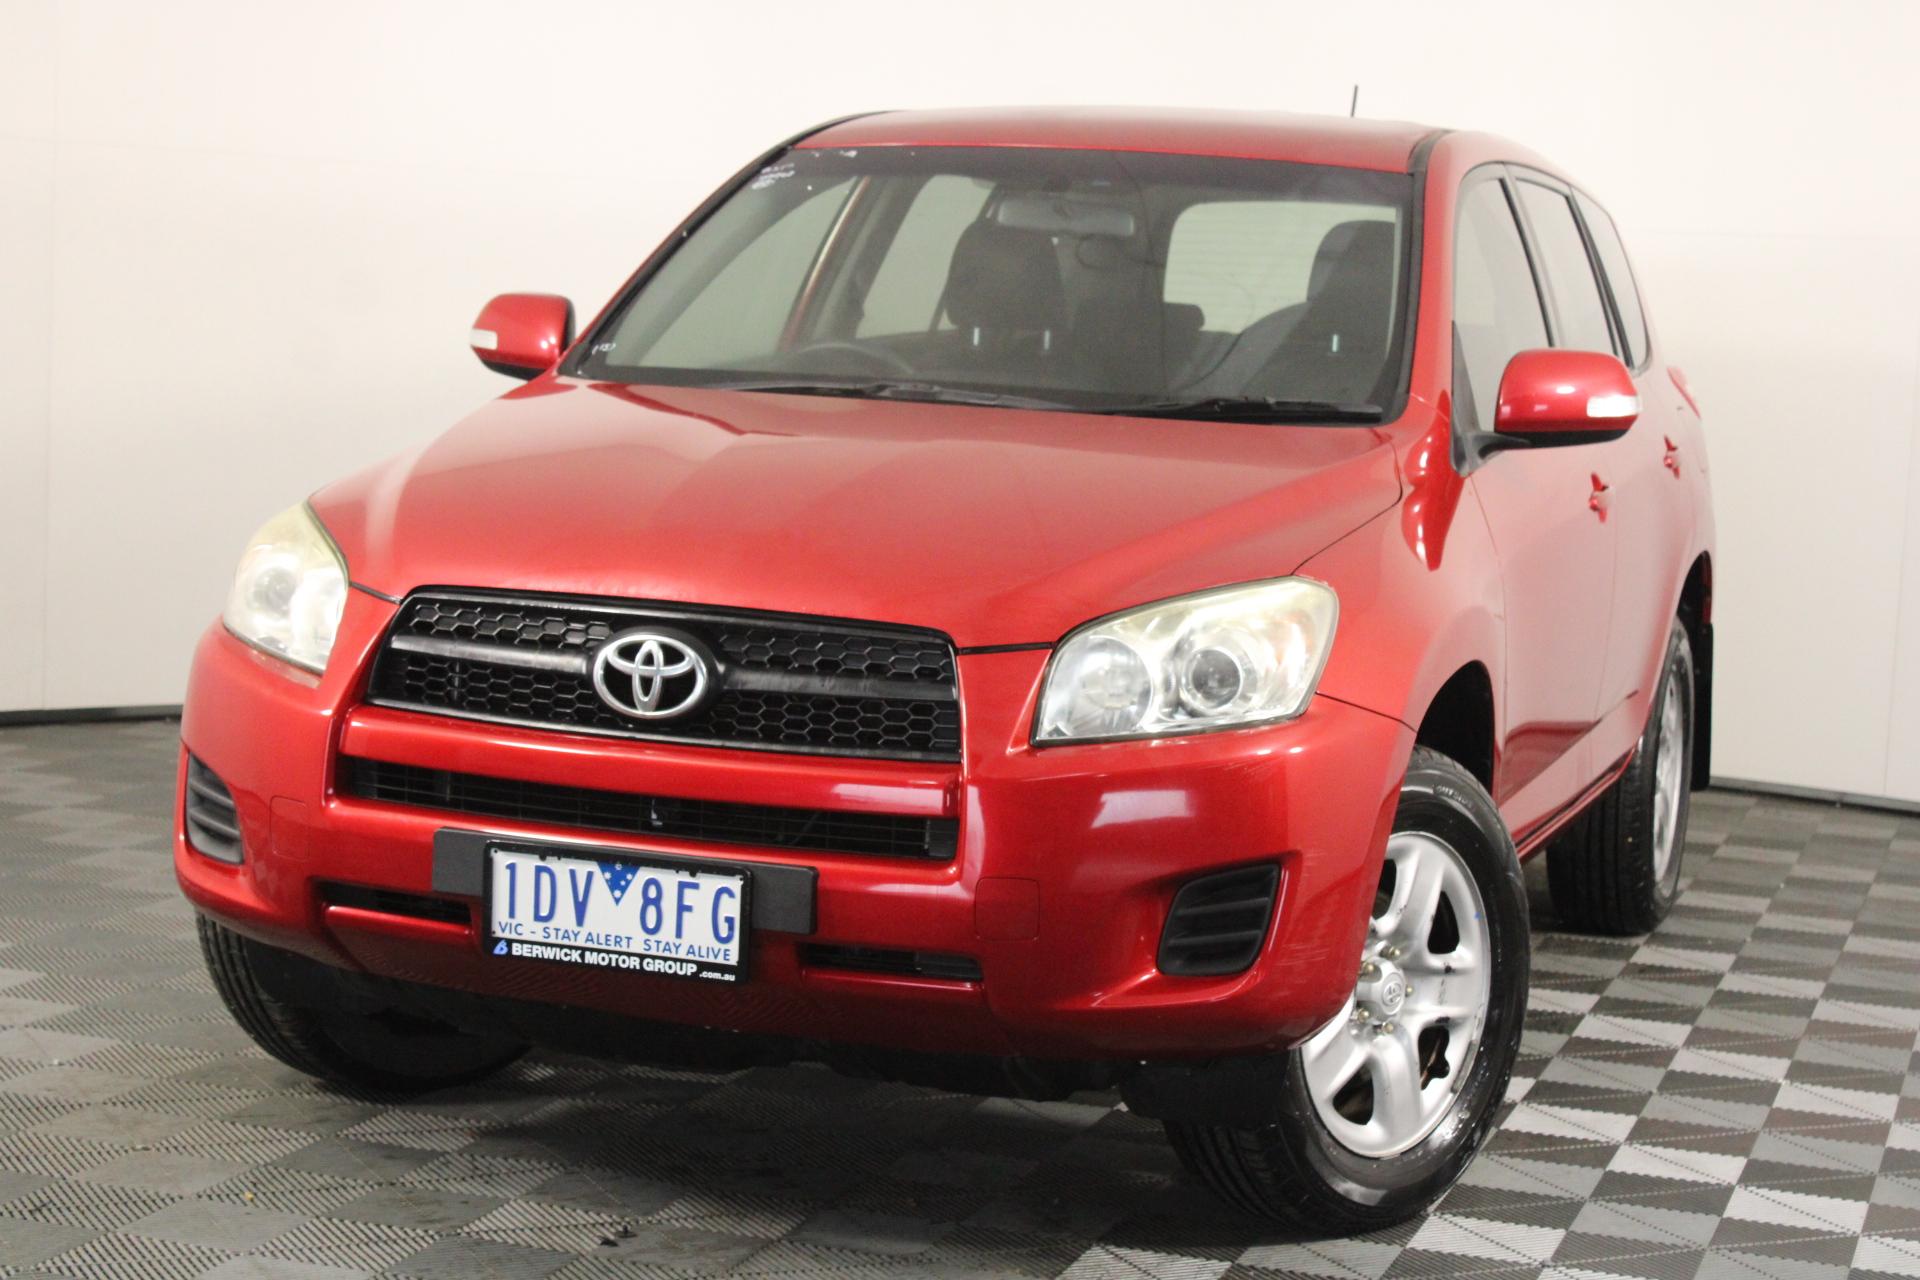 2011 Toyota Rav 4 CV (4x4) Automatic Wagon